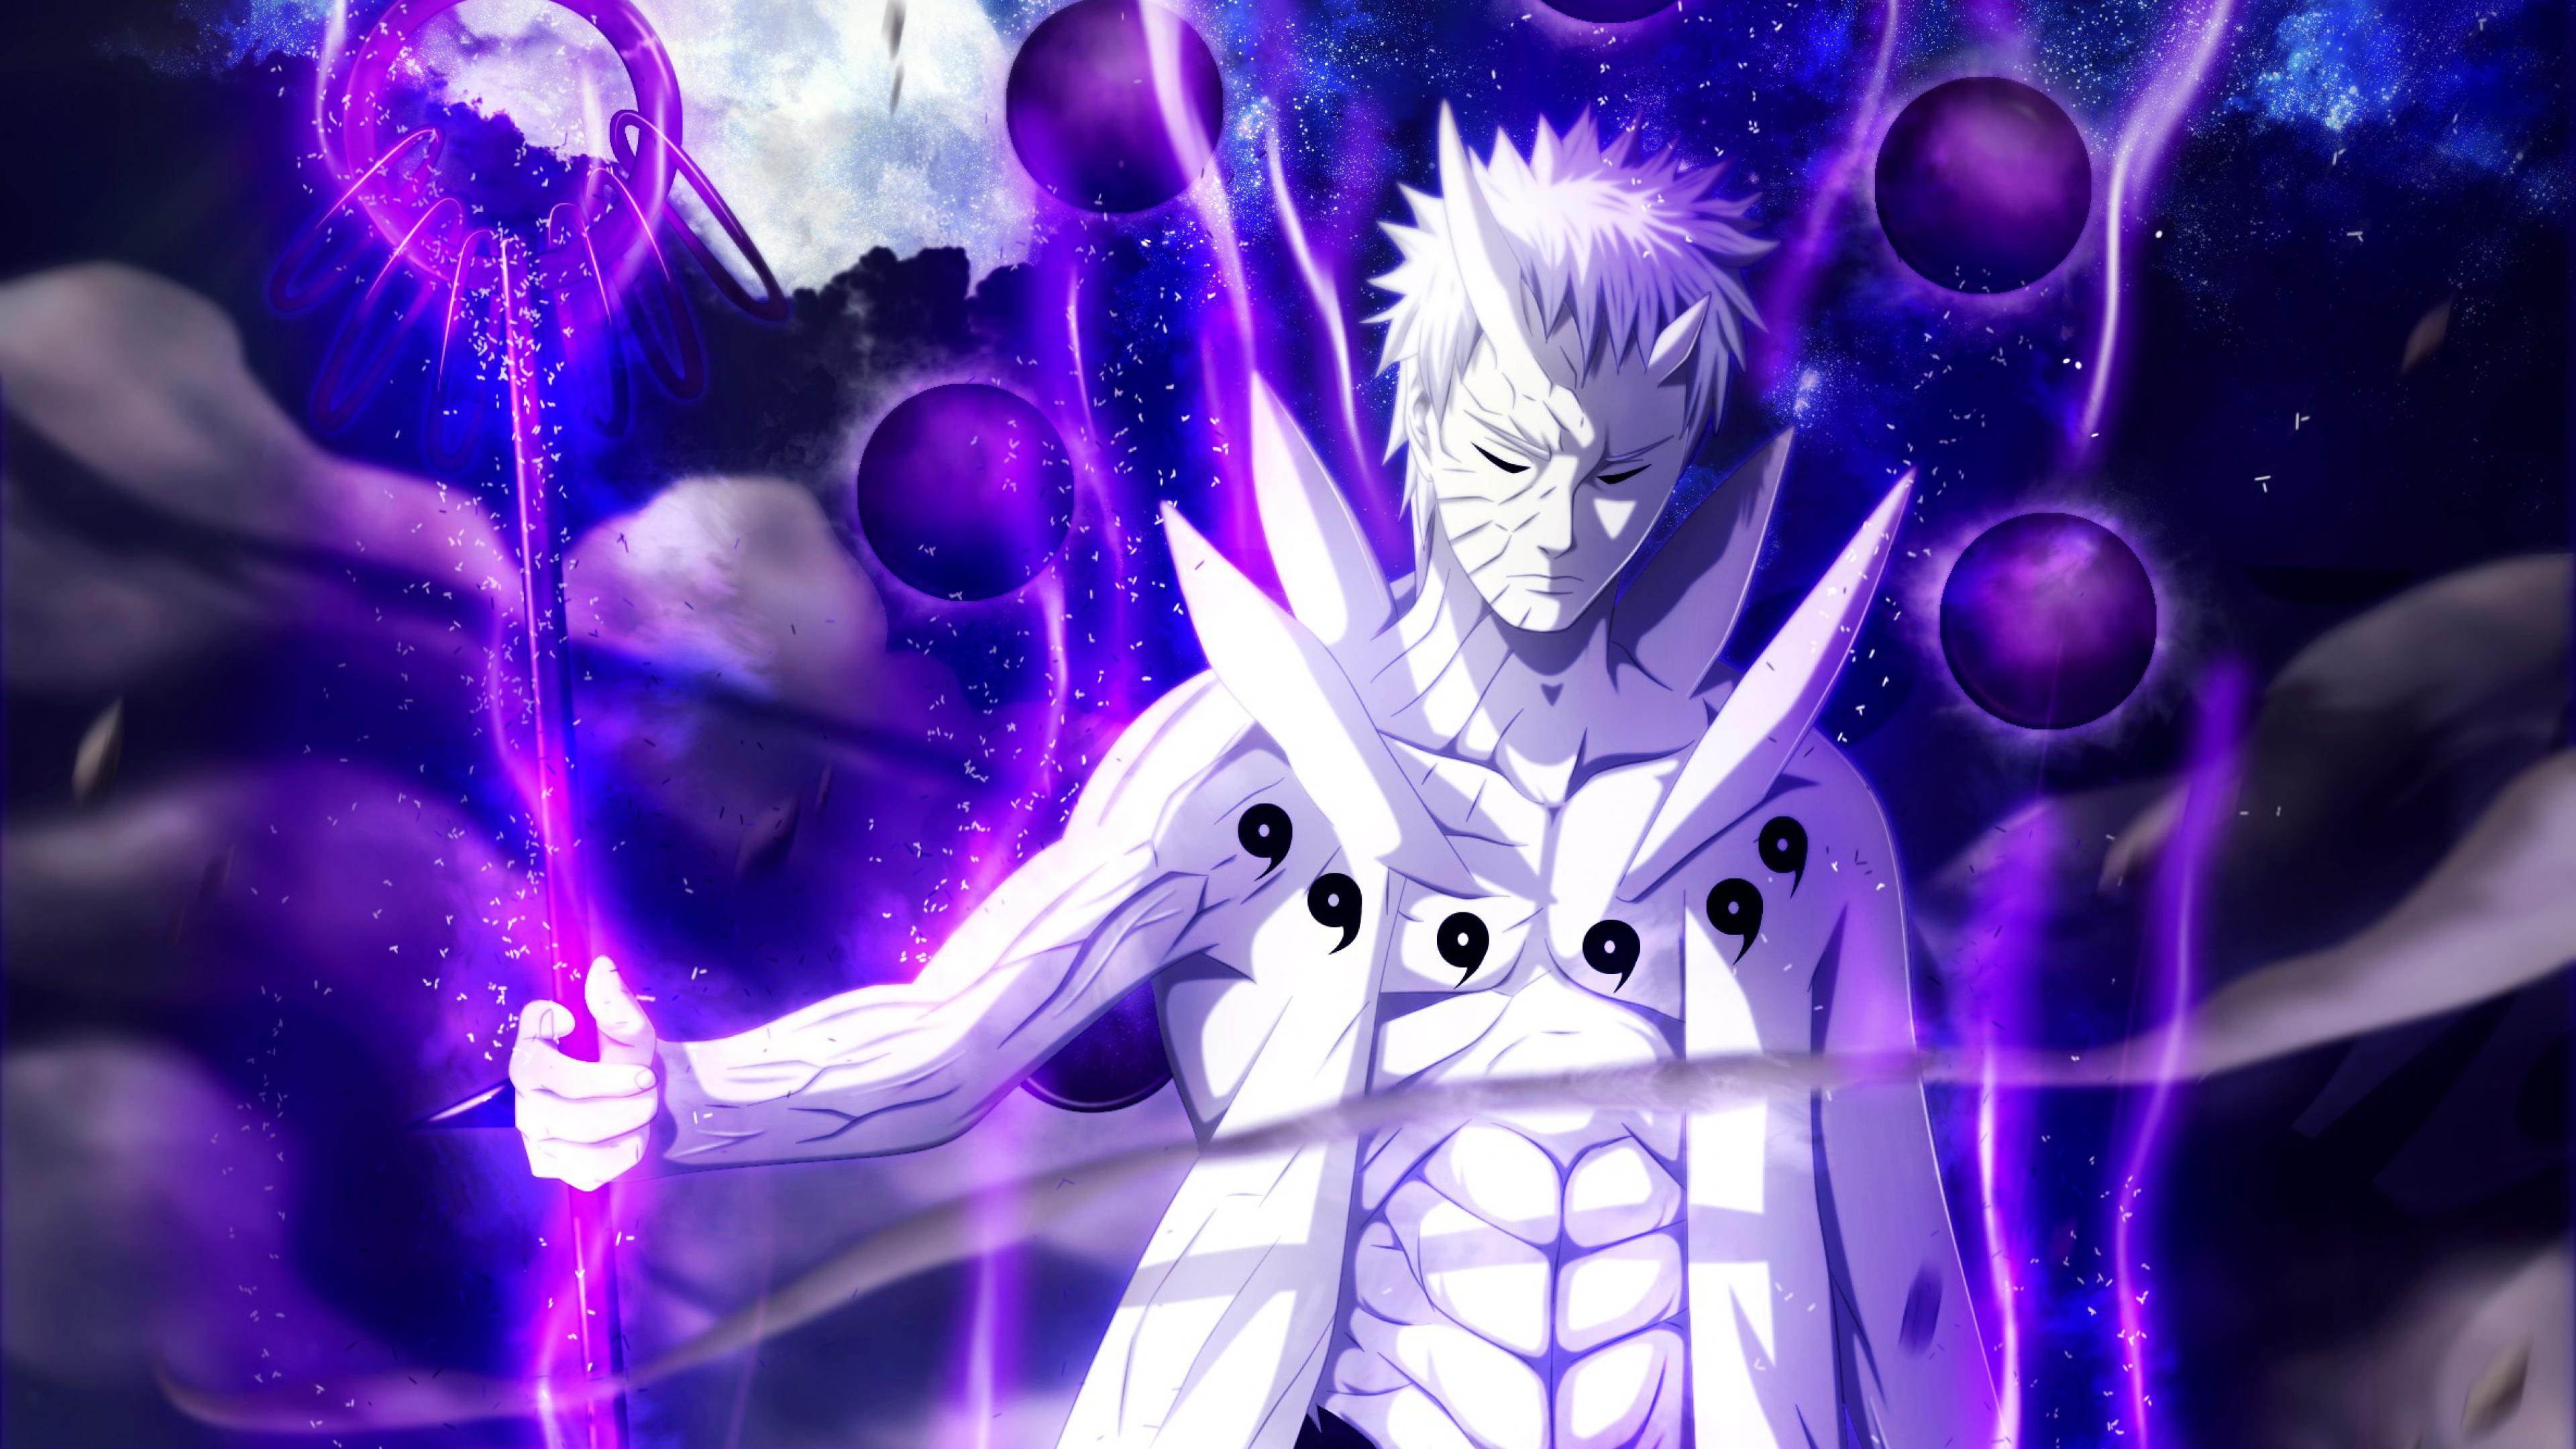 Ultra Hd Naruto Wallpapers Pc Novocom Top